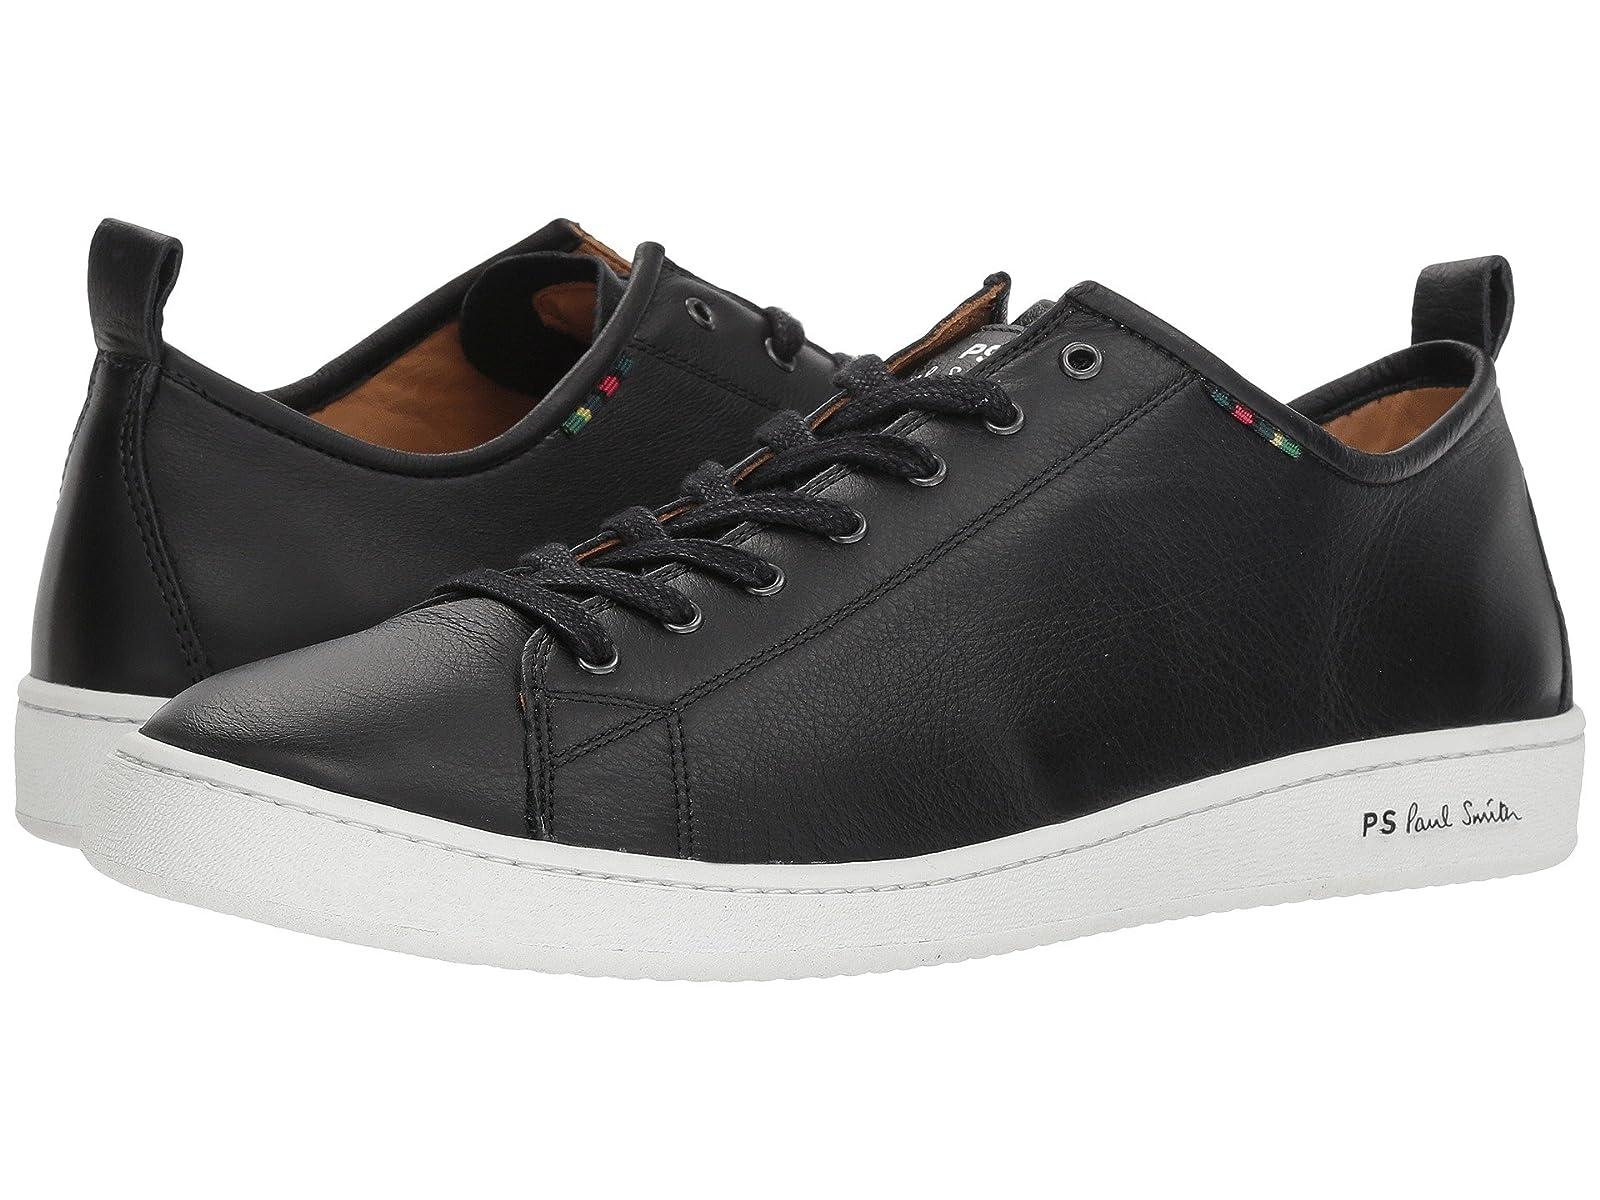 Paul Smith Miyata SneakerAtmospheric grades have affordable shoes